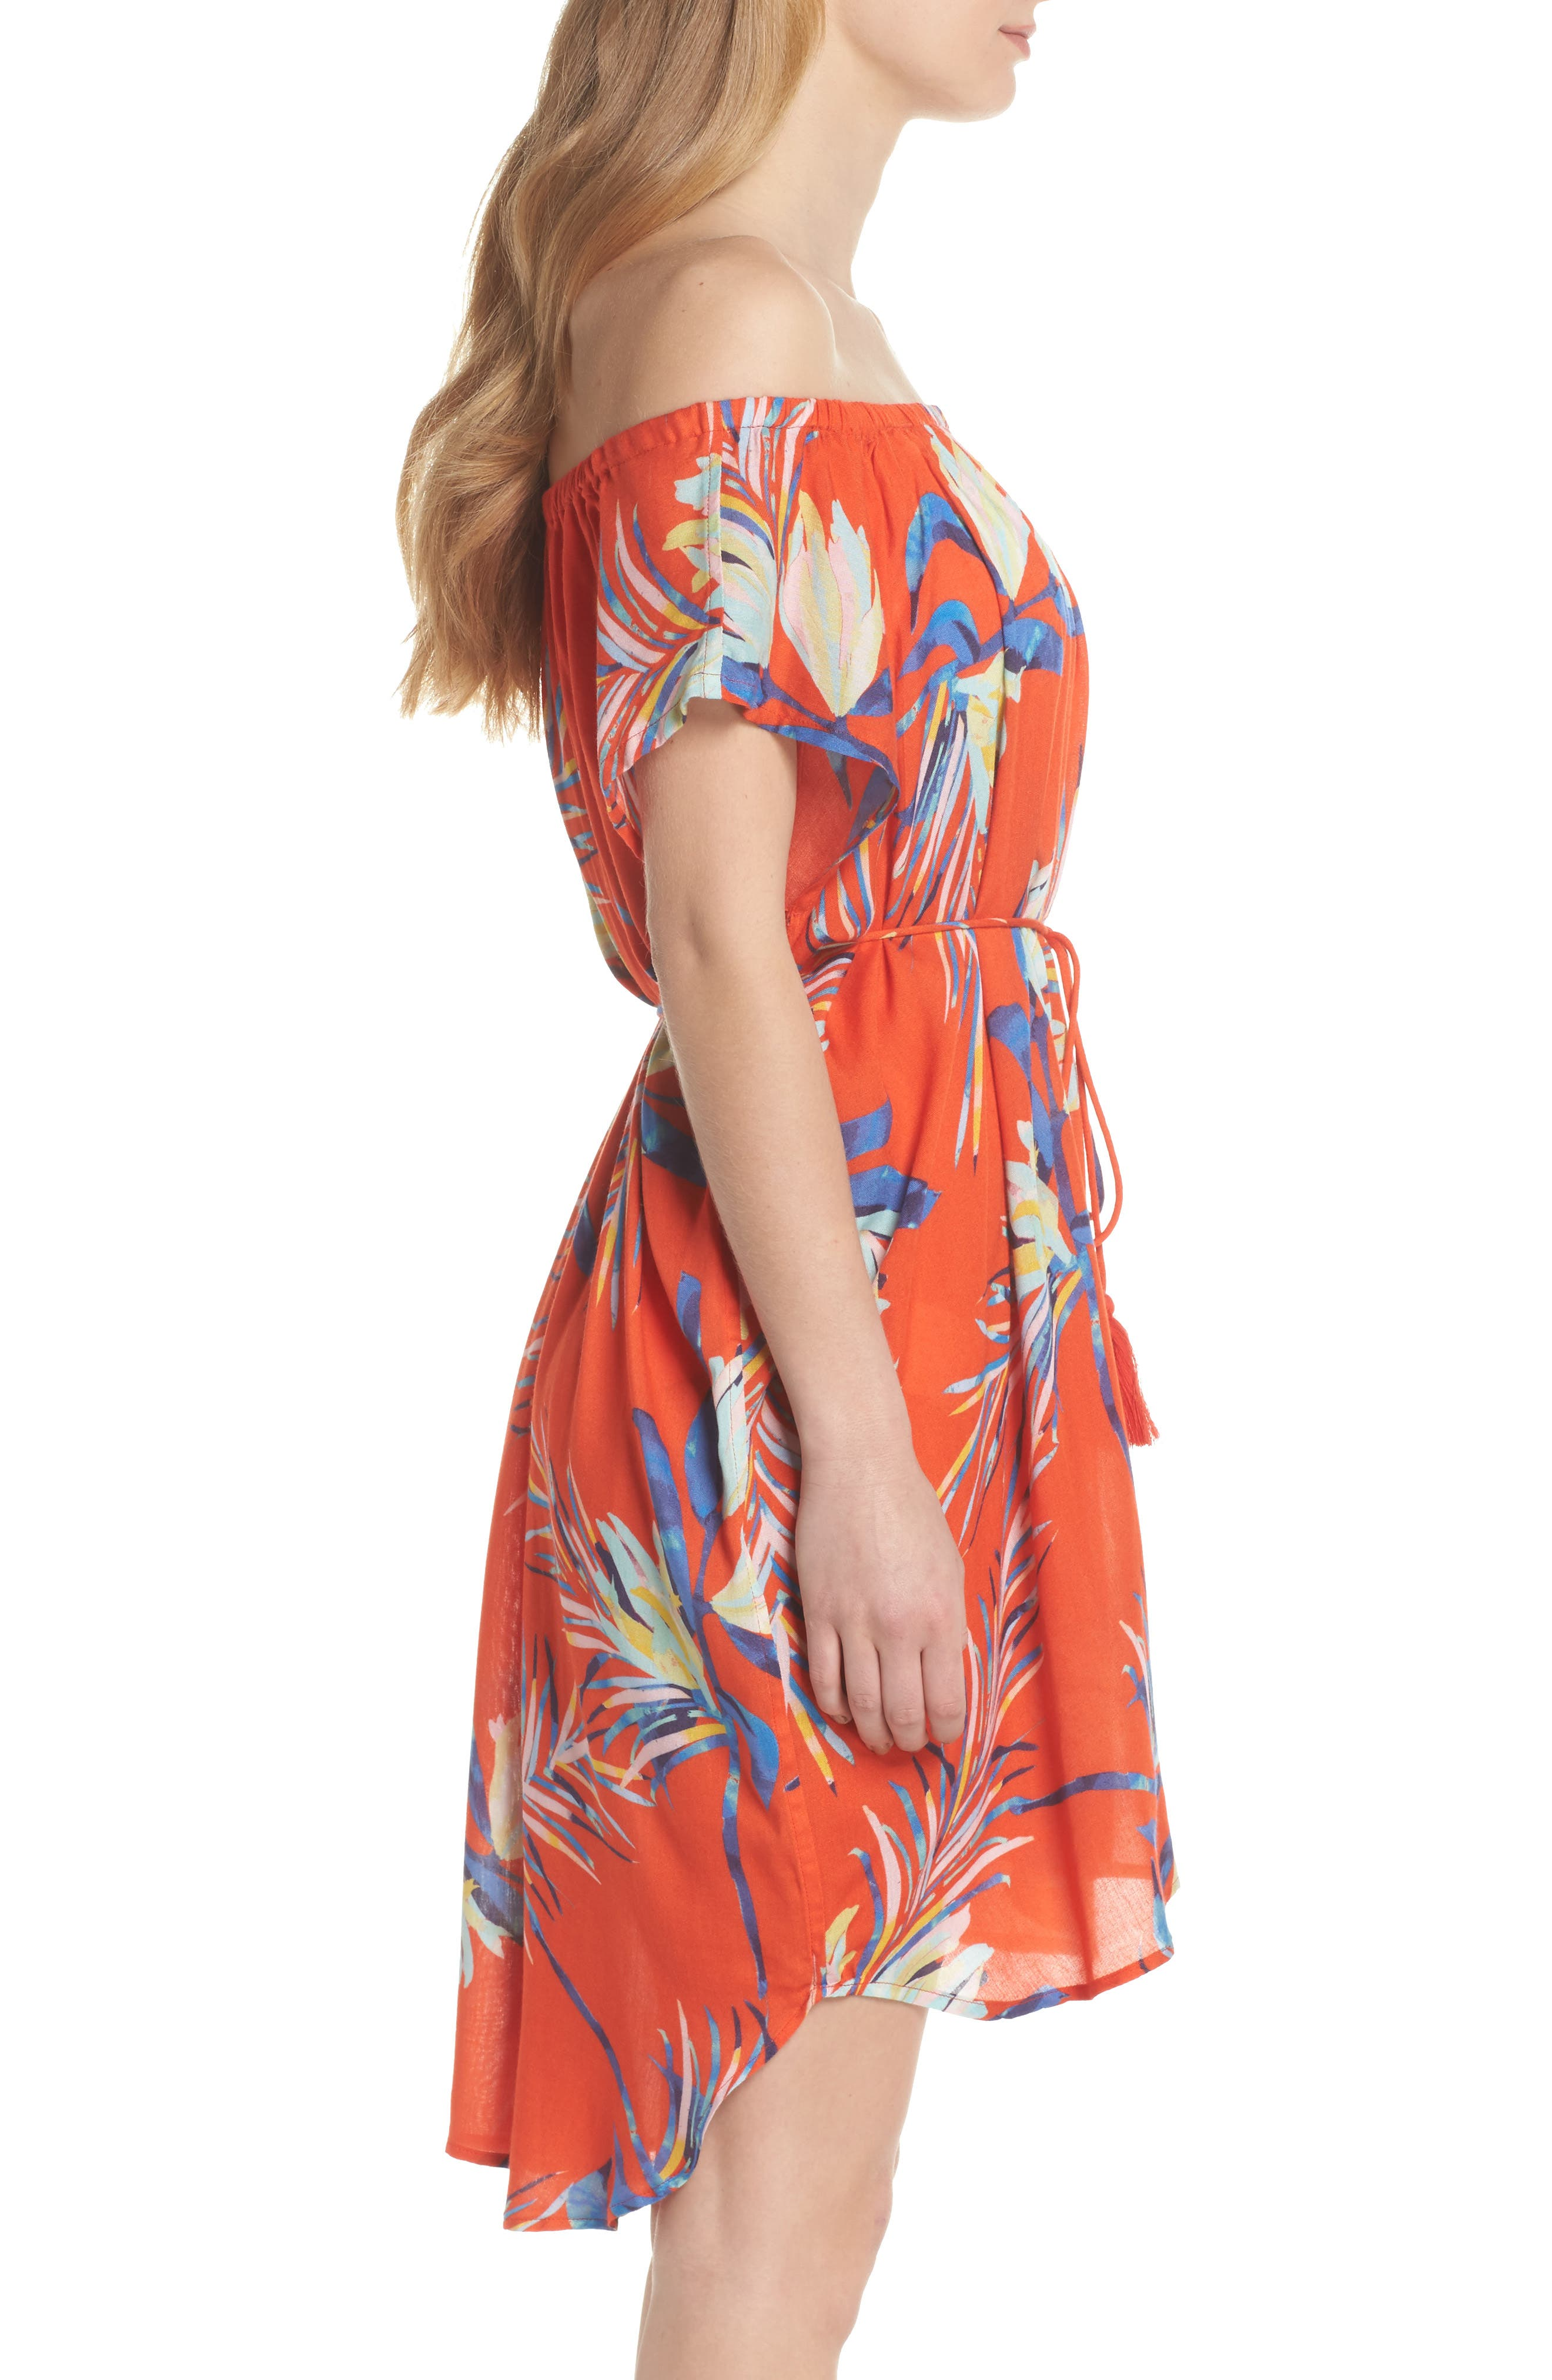 Paradise Palm Off the Shoulder Cover-Up Dress,                             Alternate thumbnail 3, color,                             Tangerine